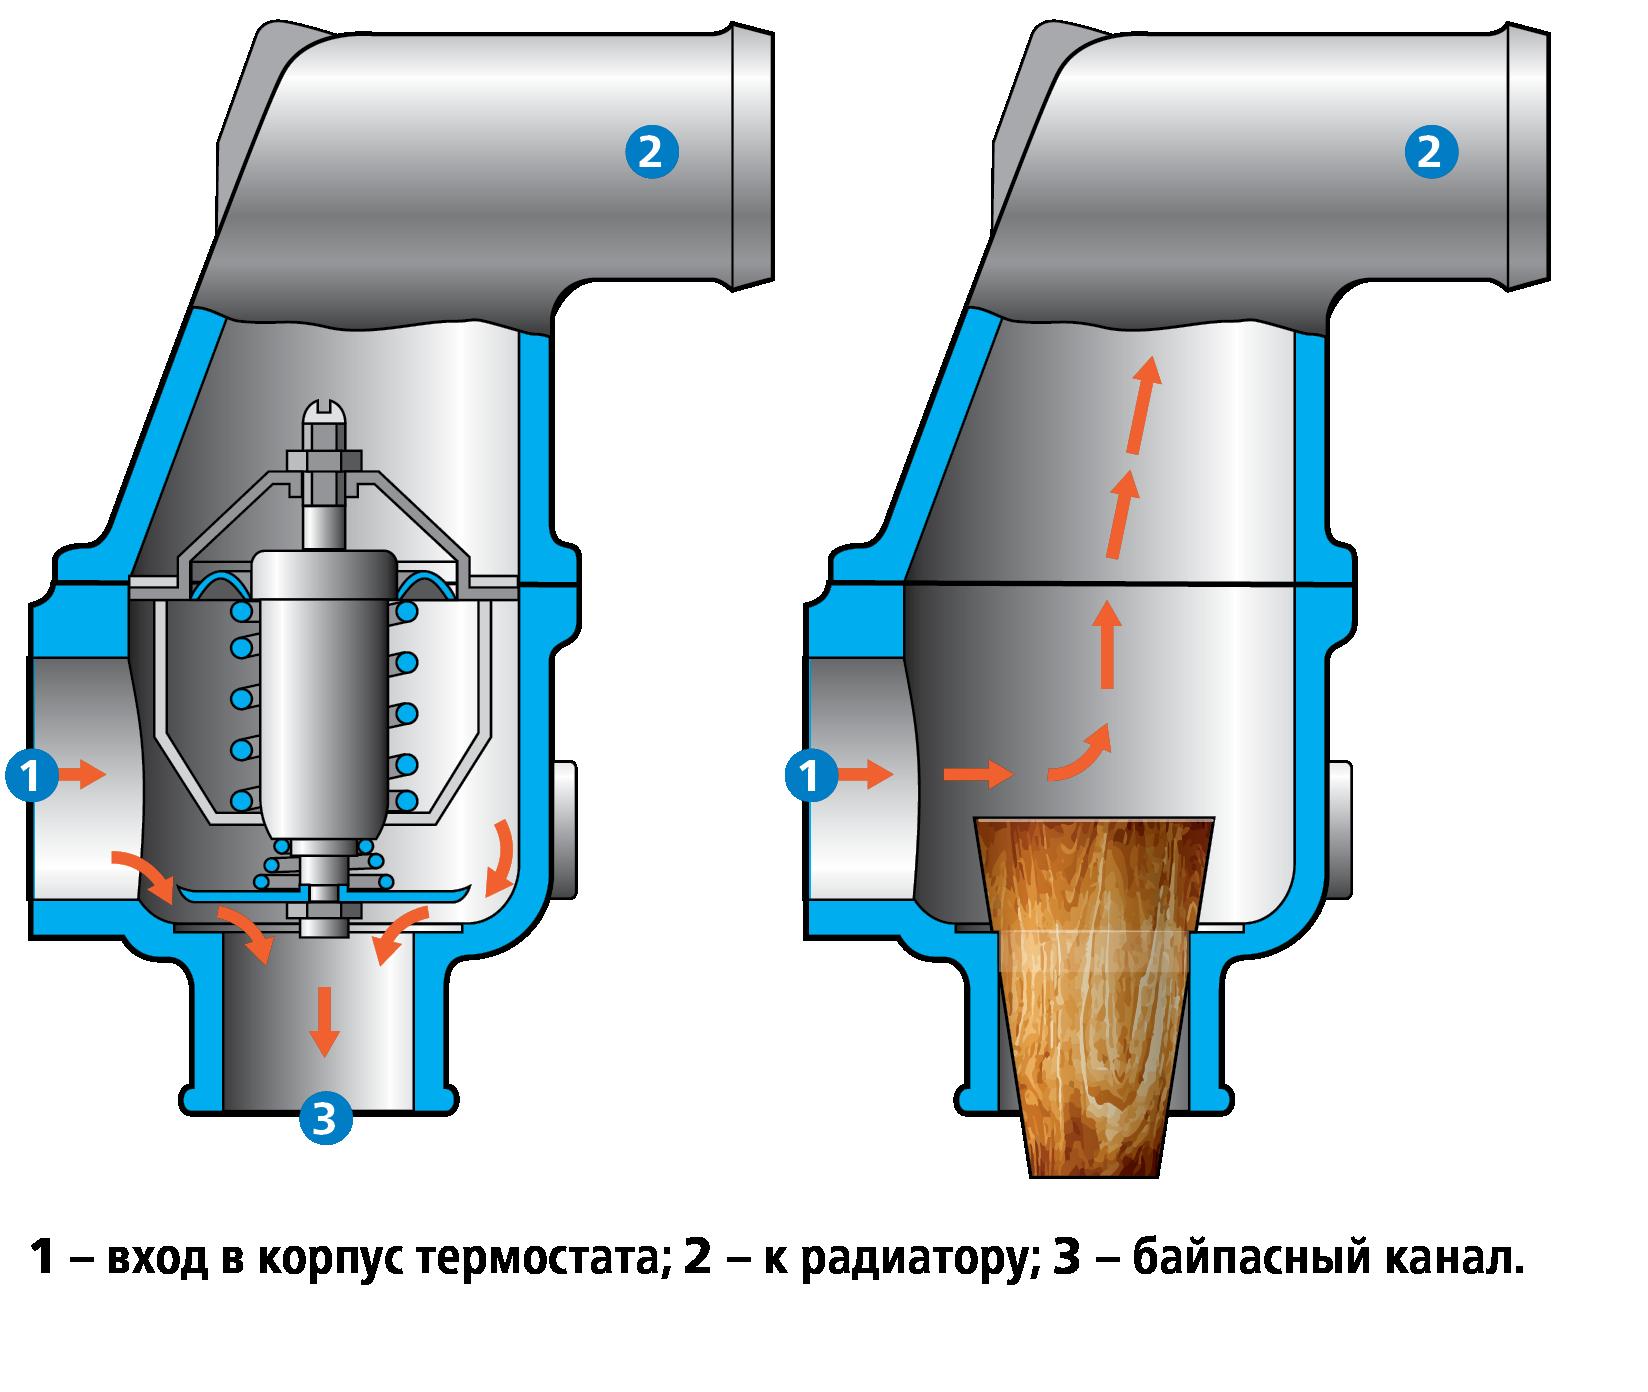 Конкурс знатоков: задача про электронный газ, Логан иДастер— фото 798561